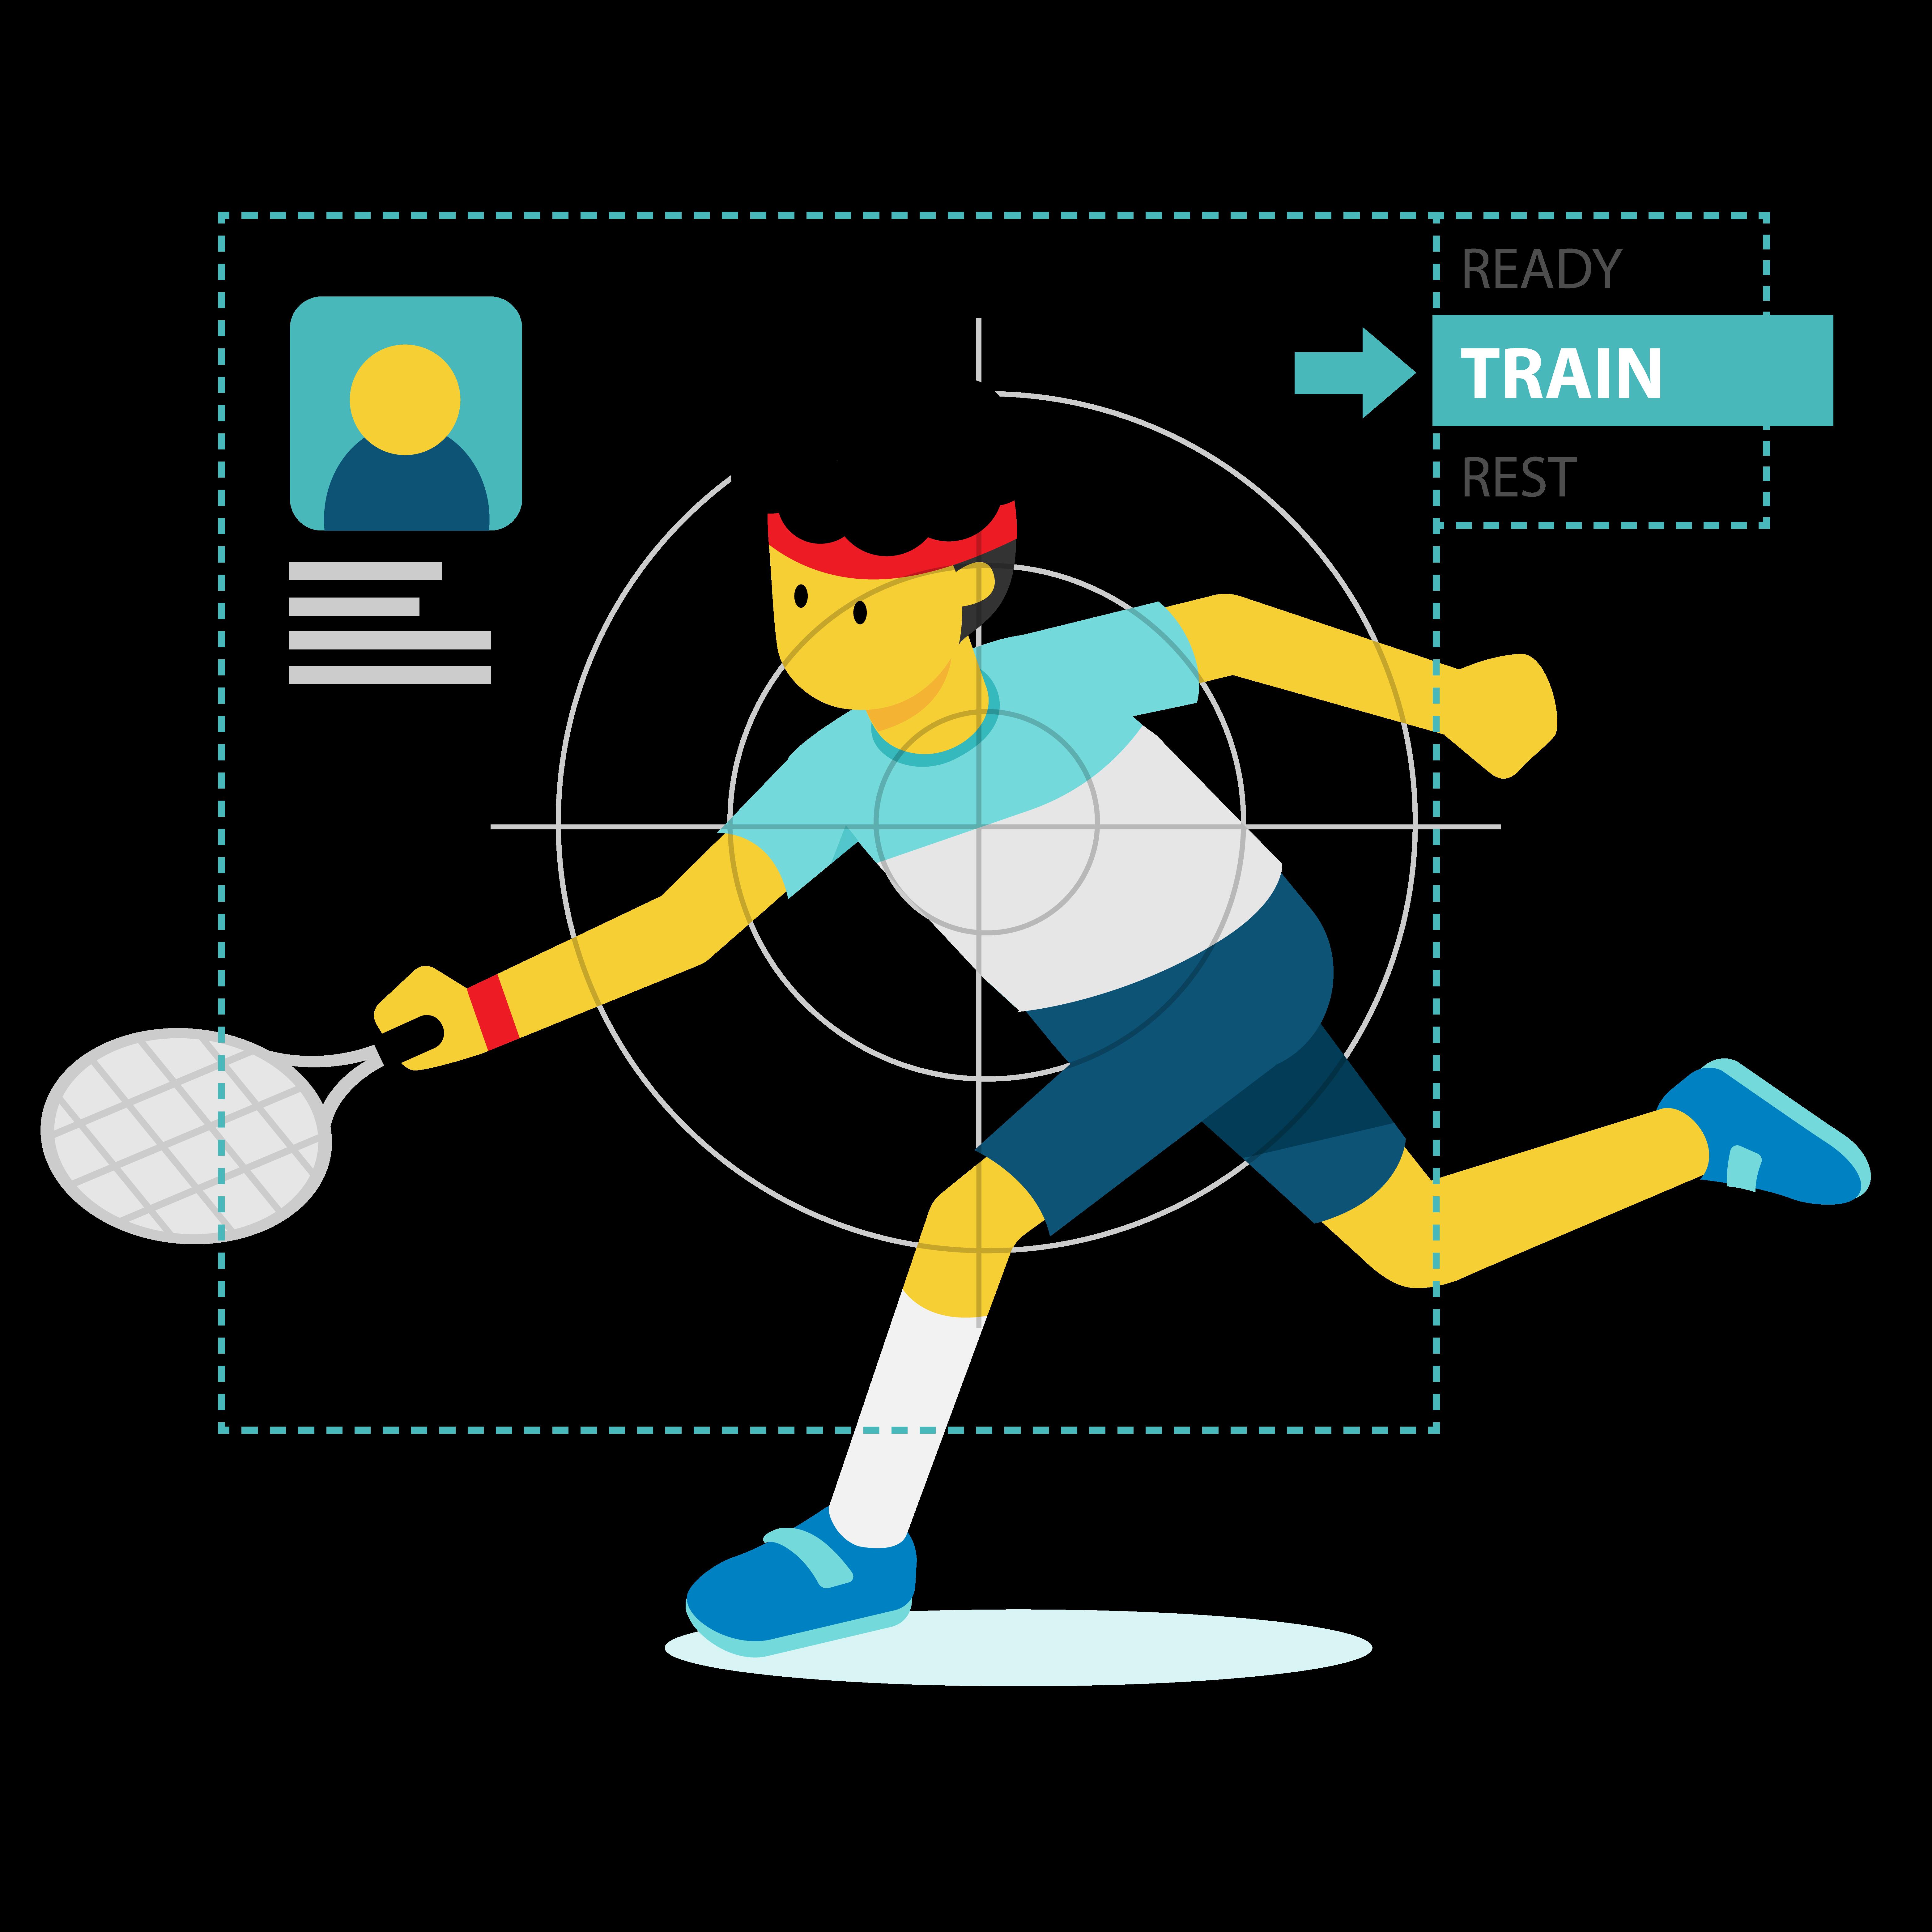 Clipboard clipart attendance record. Tennis locker app analyze